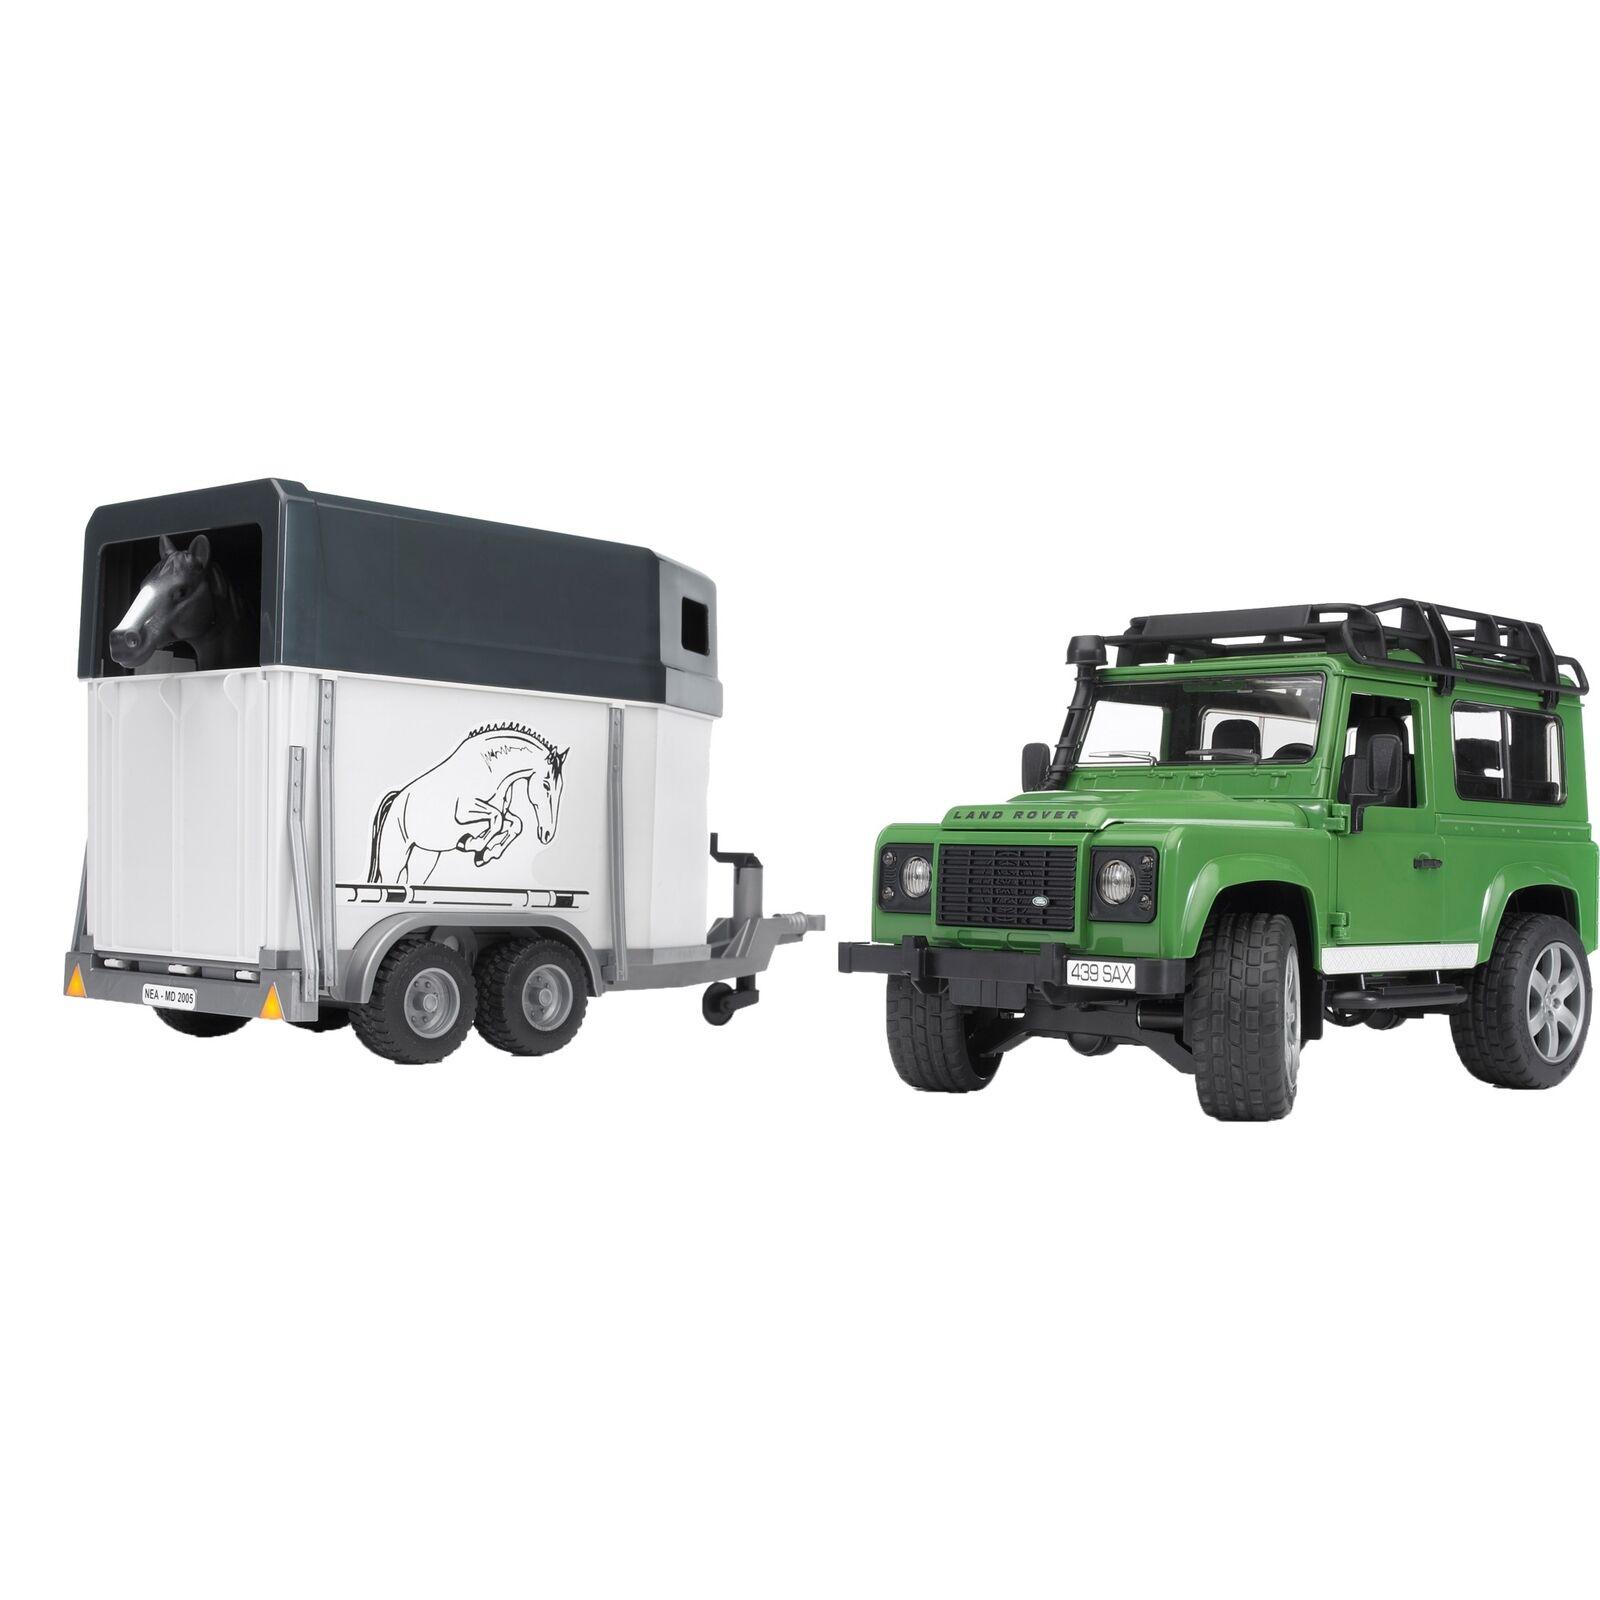 Bruder Land Rover Defender mit Pferdeanhänger inkl. 1 Pferd Modellfahrzeug